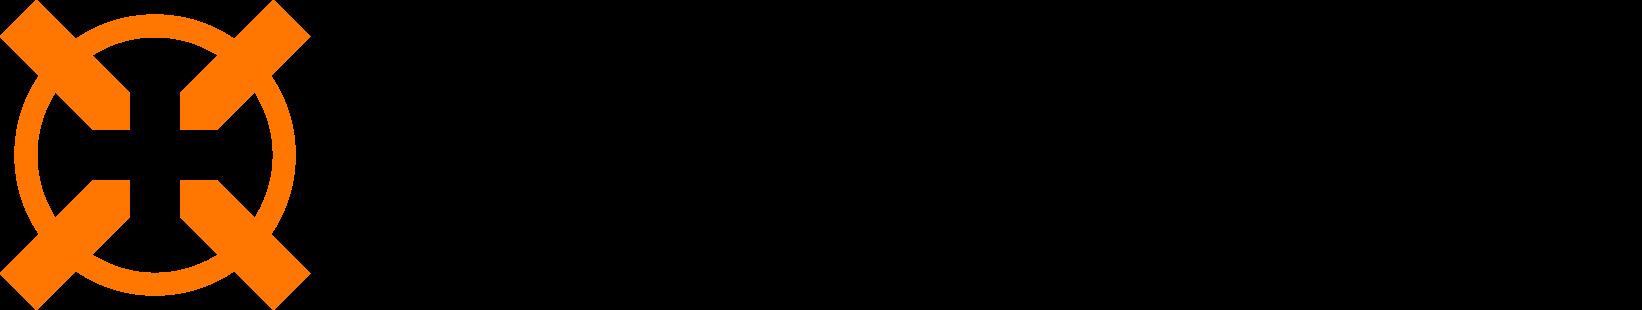 Hitmarker primary orange and black logo